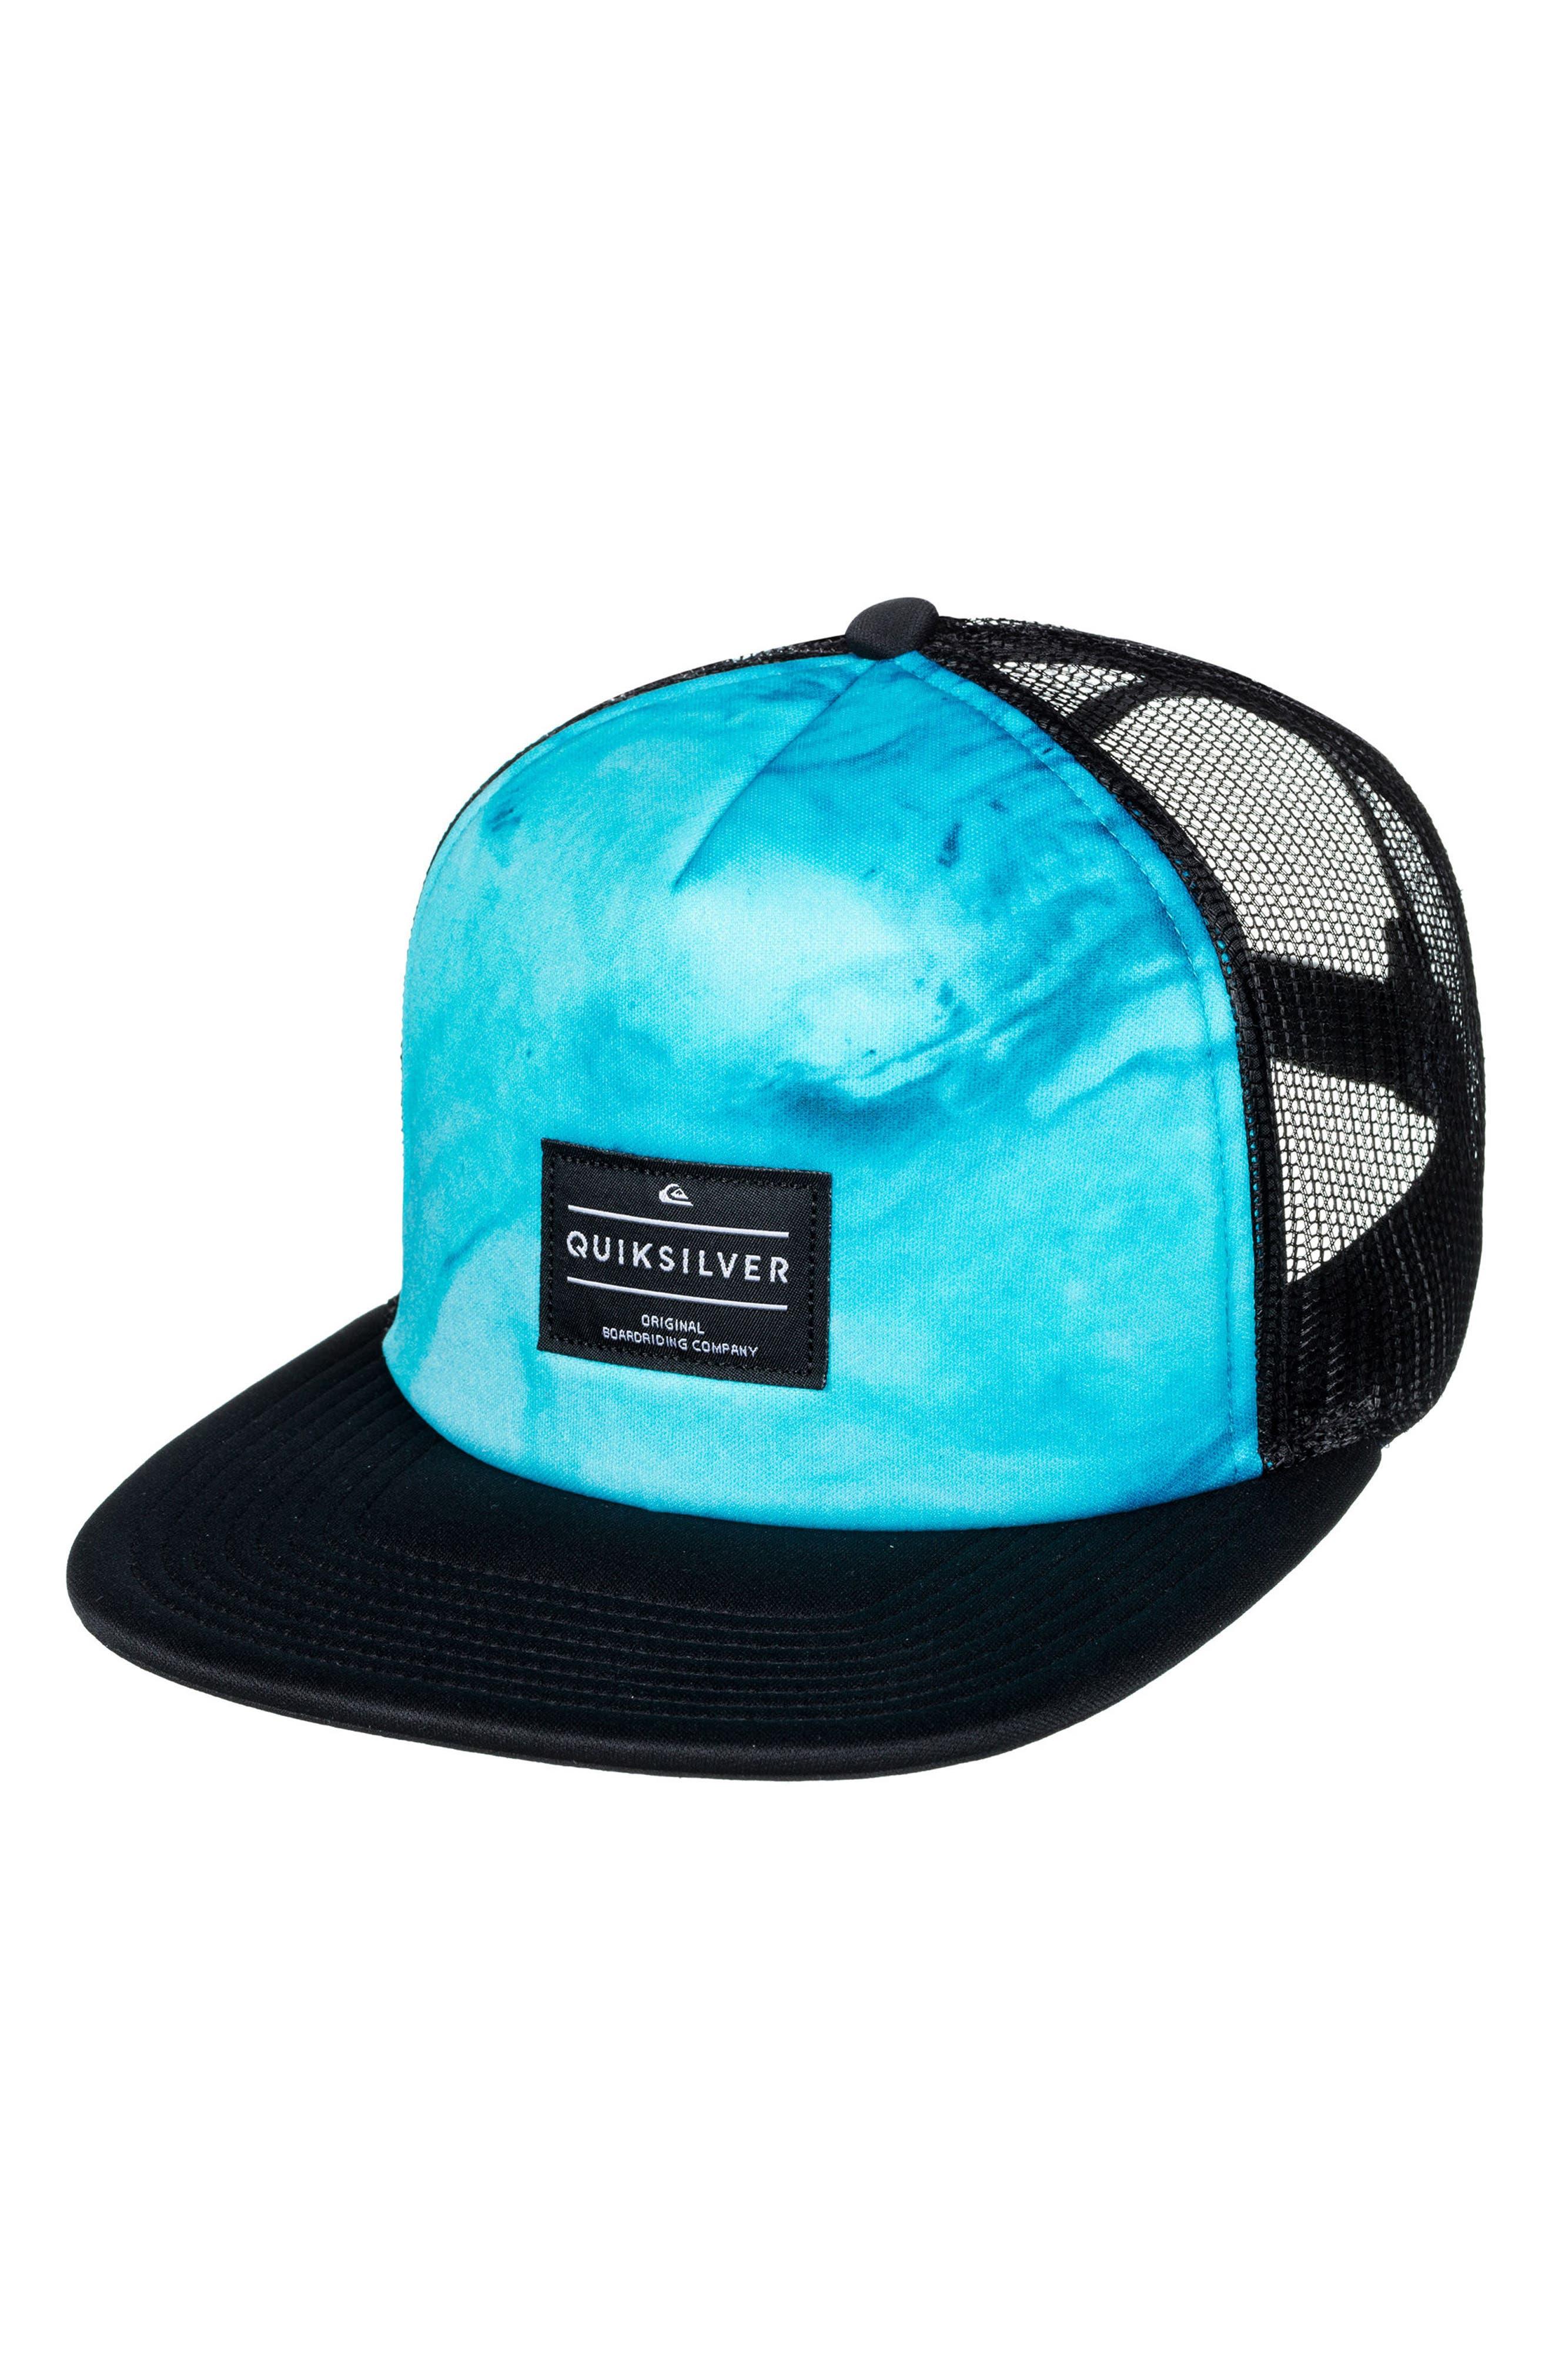 Brissells Snapback Trucker Hat,                         Main,                         color, Black